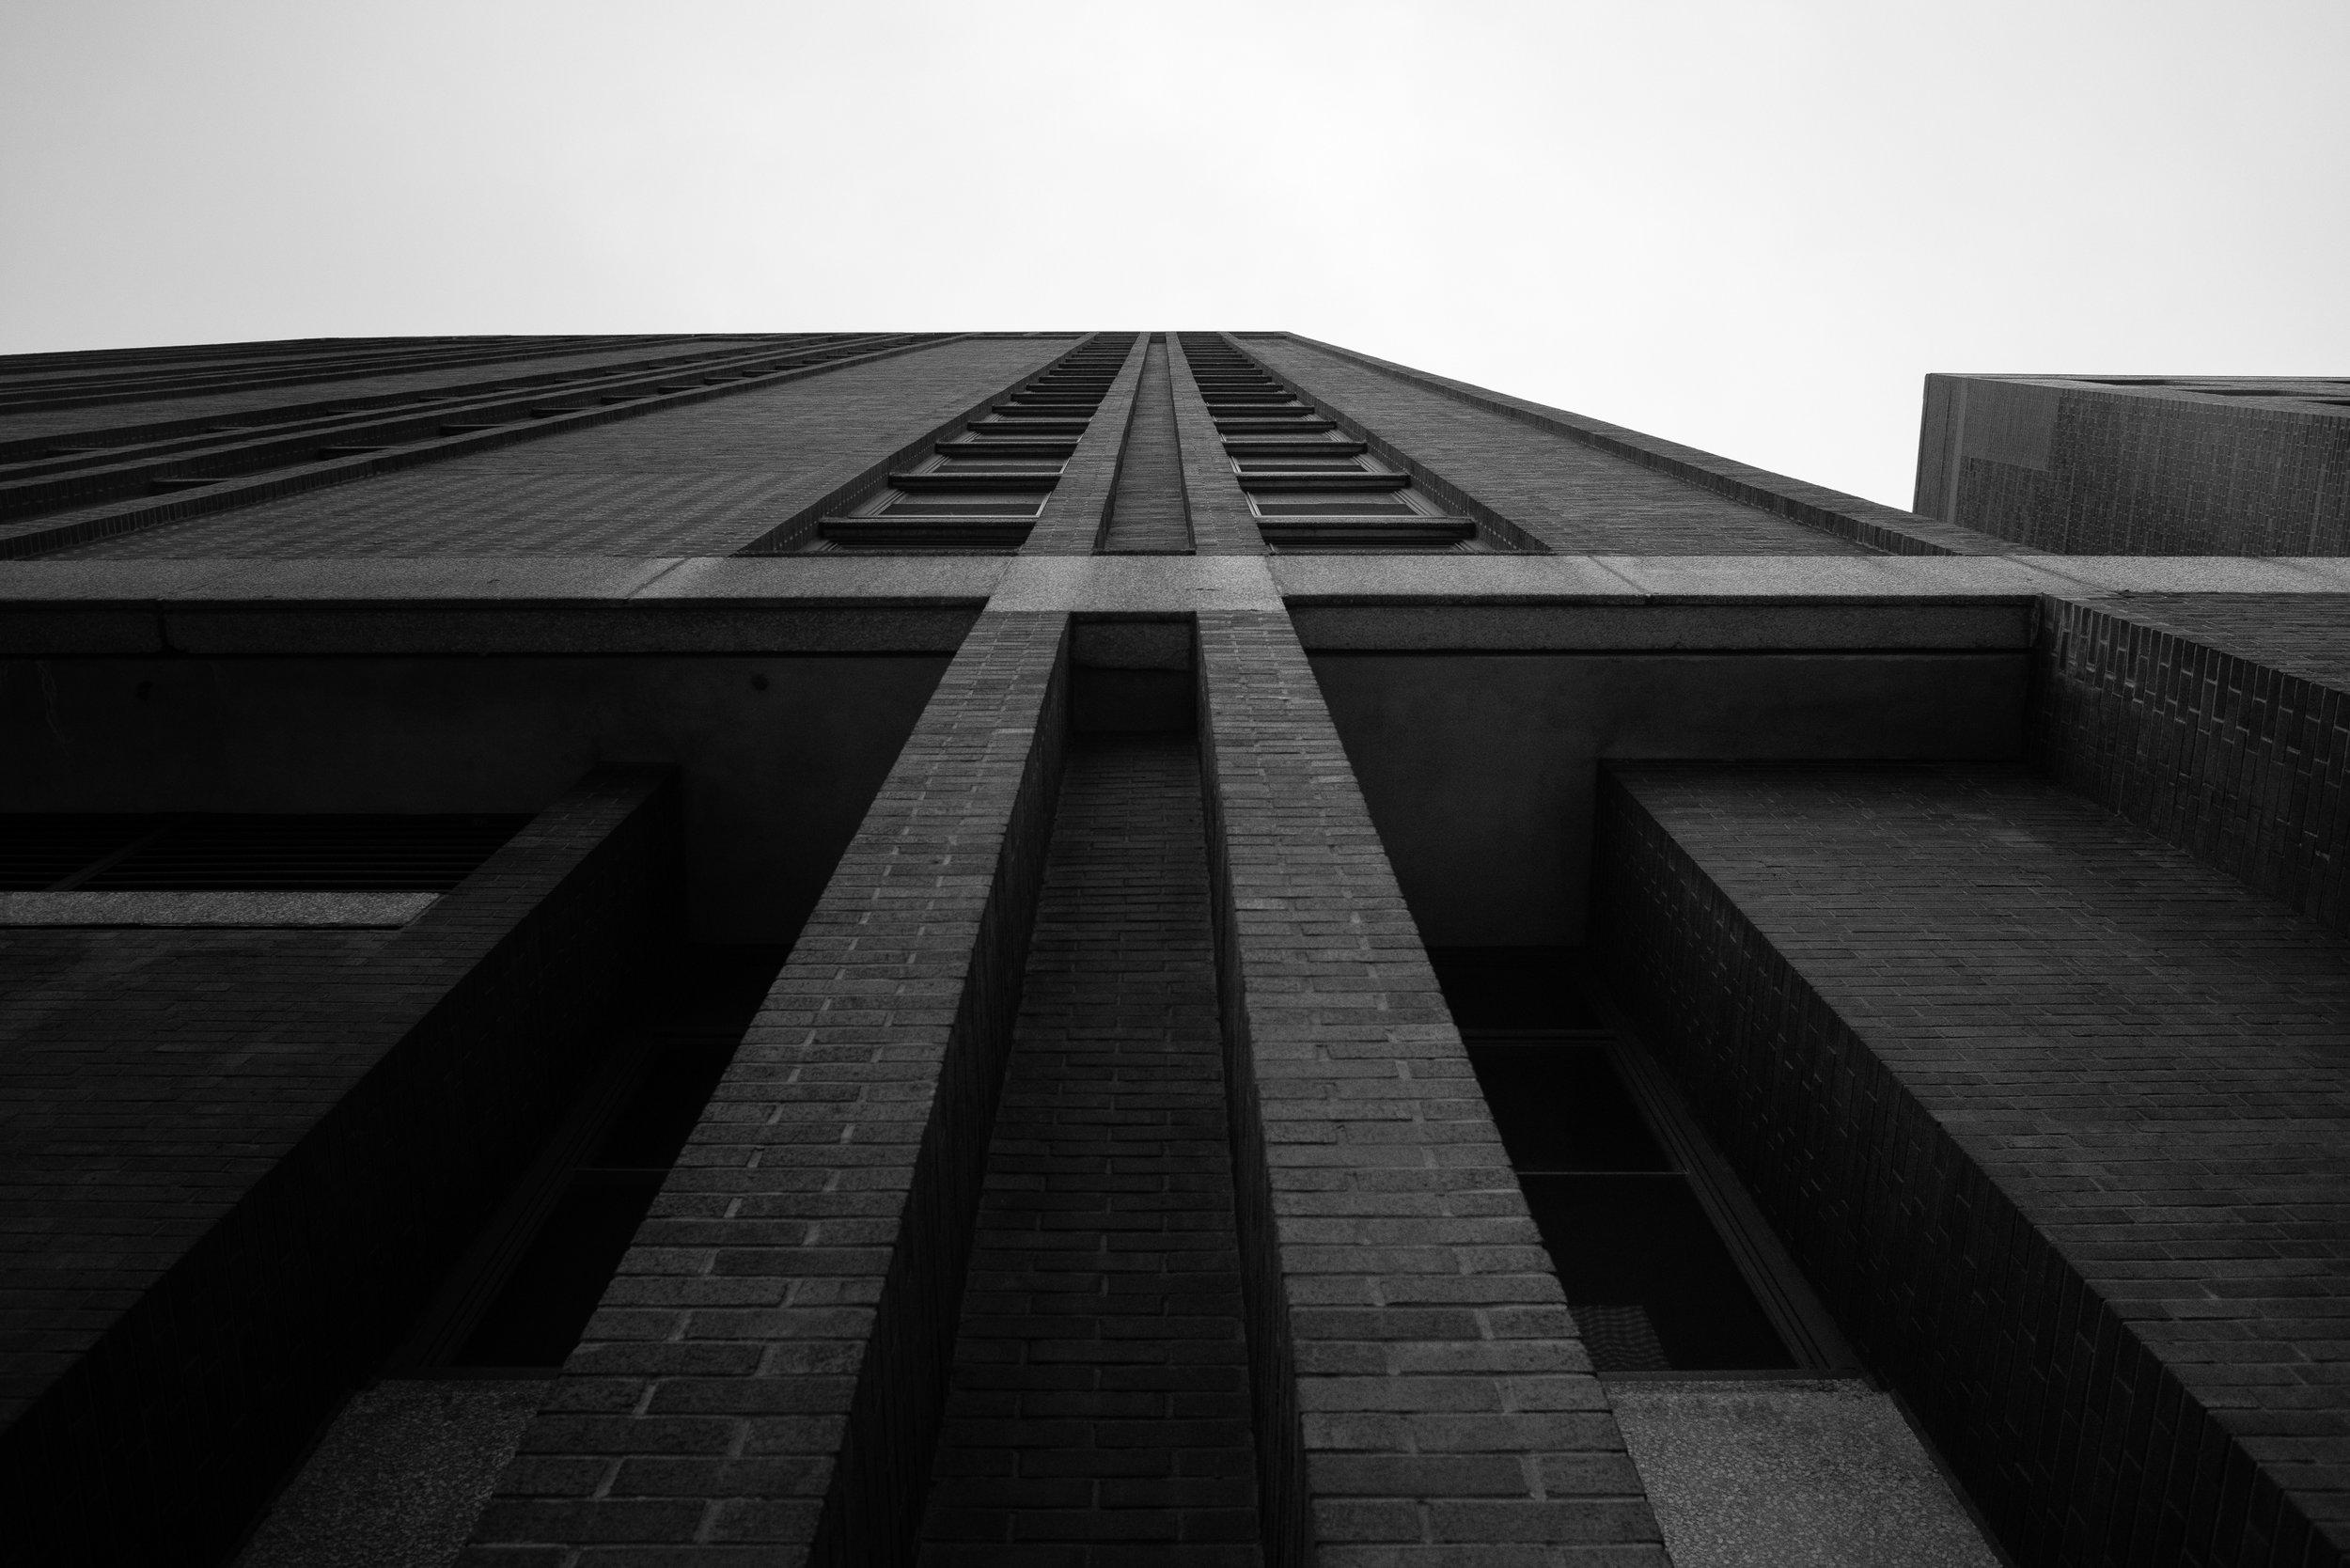 David-Olivier-Gascon-photography-chicago-studiod-montreal--07577.jpg